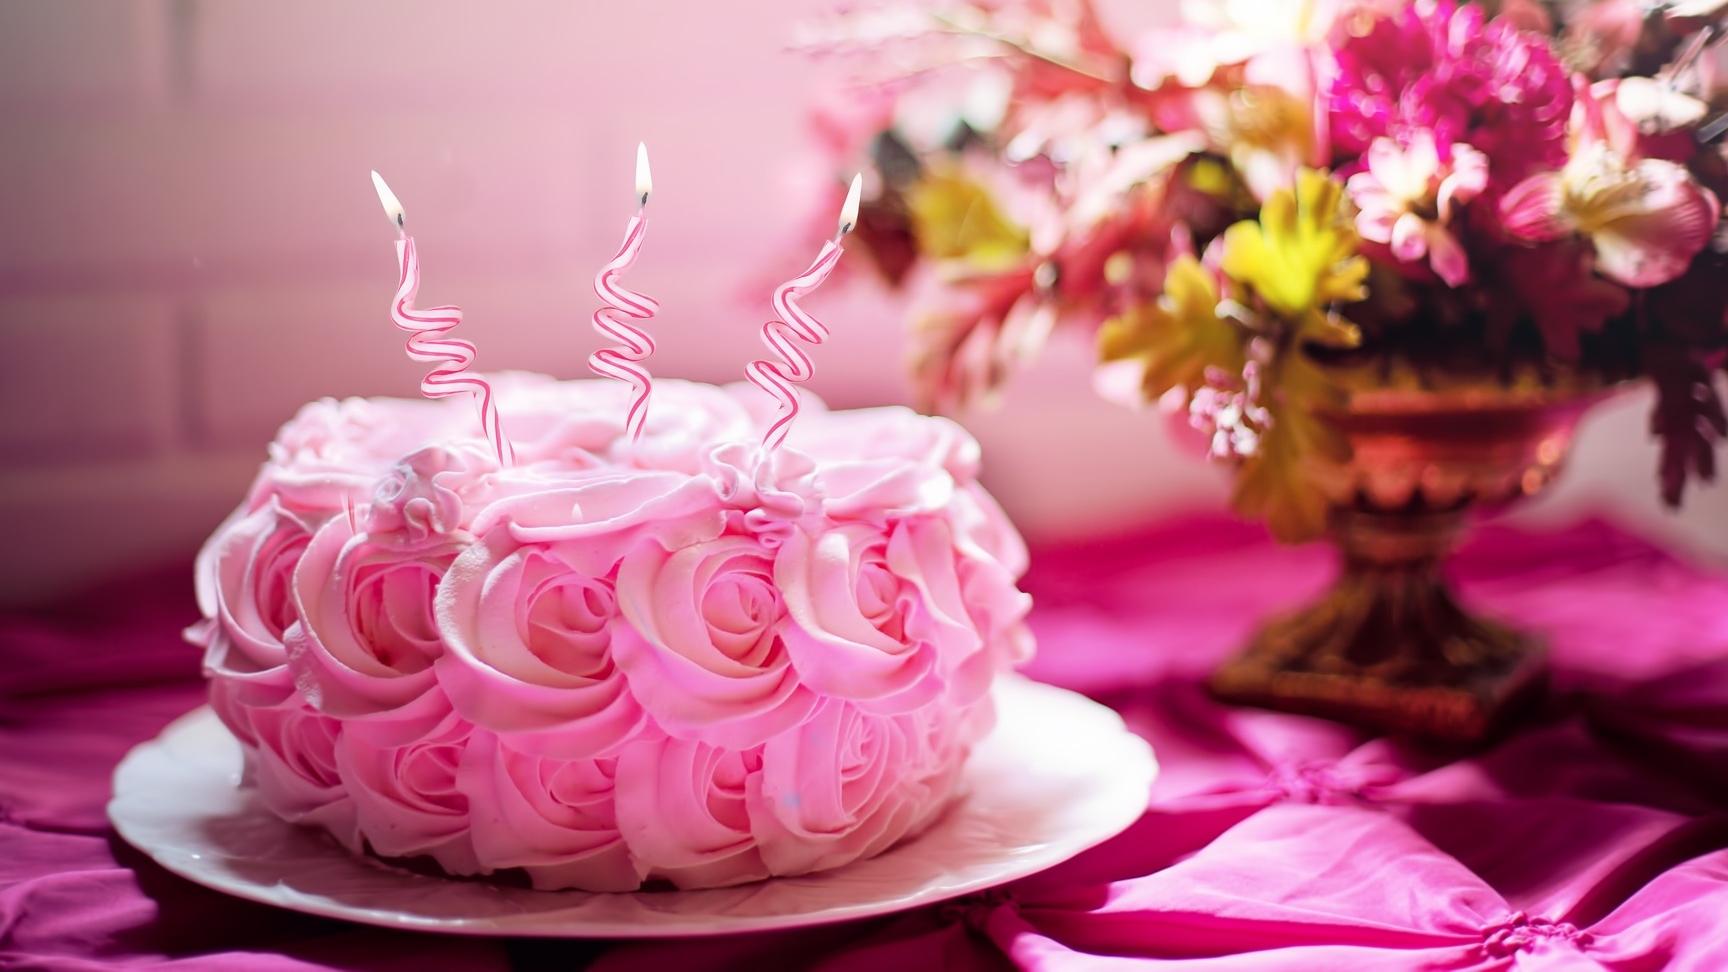 kaj-pomeni-vas-dan-rojstva (1)